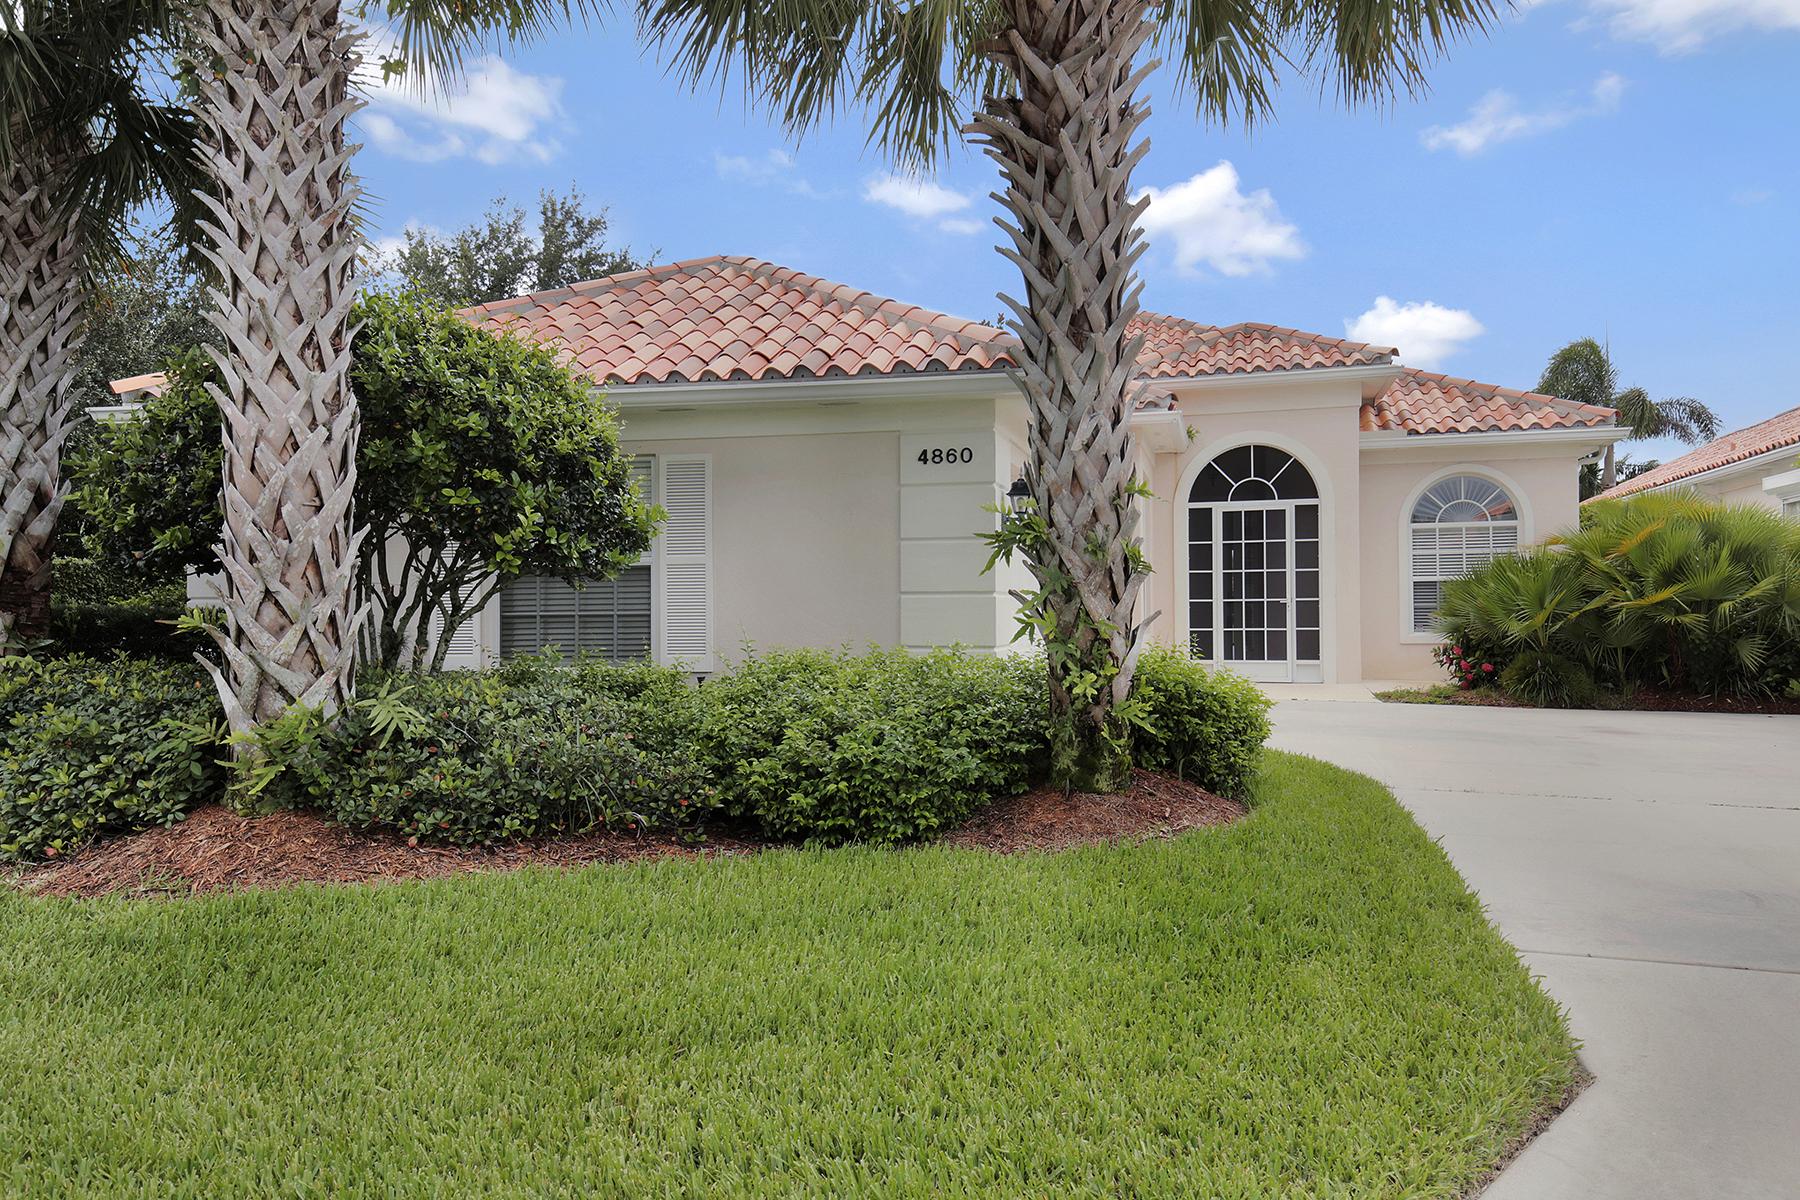 Single Family Home for Sale at VILLAGE WALK 4860 San Pablo Ct Naples, Florida 34109 United States